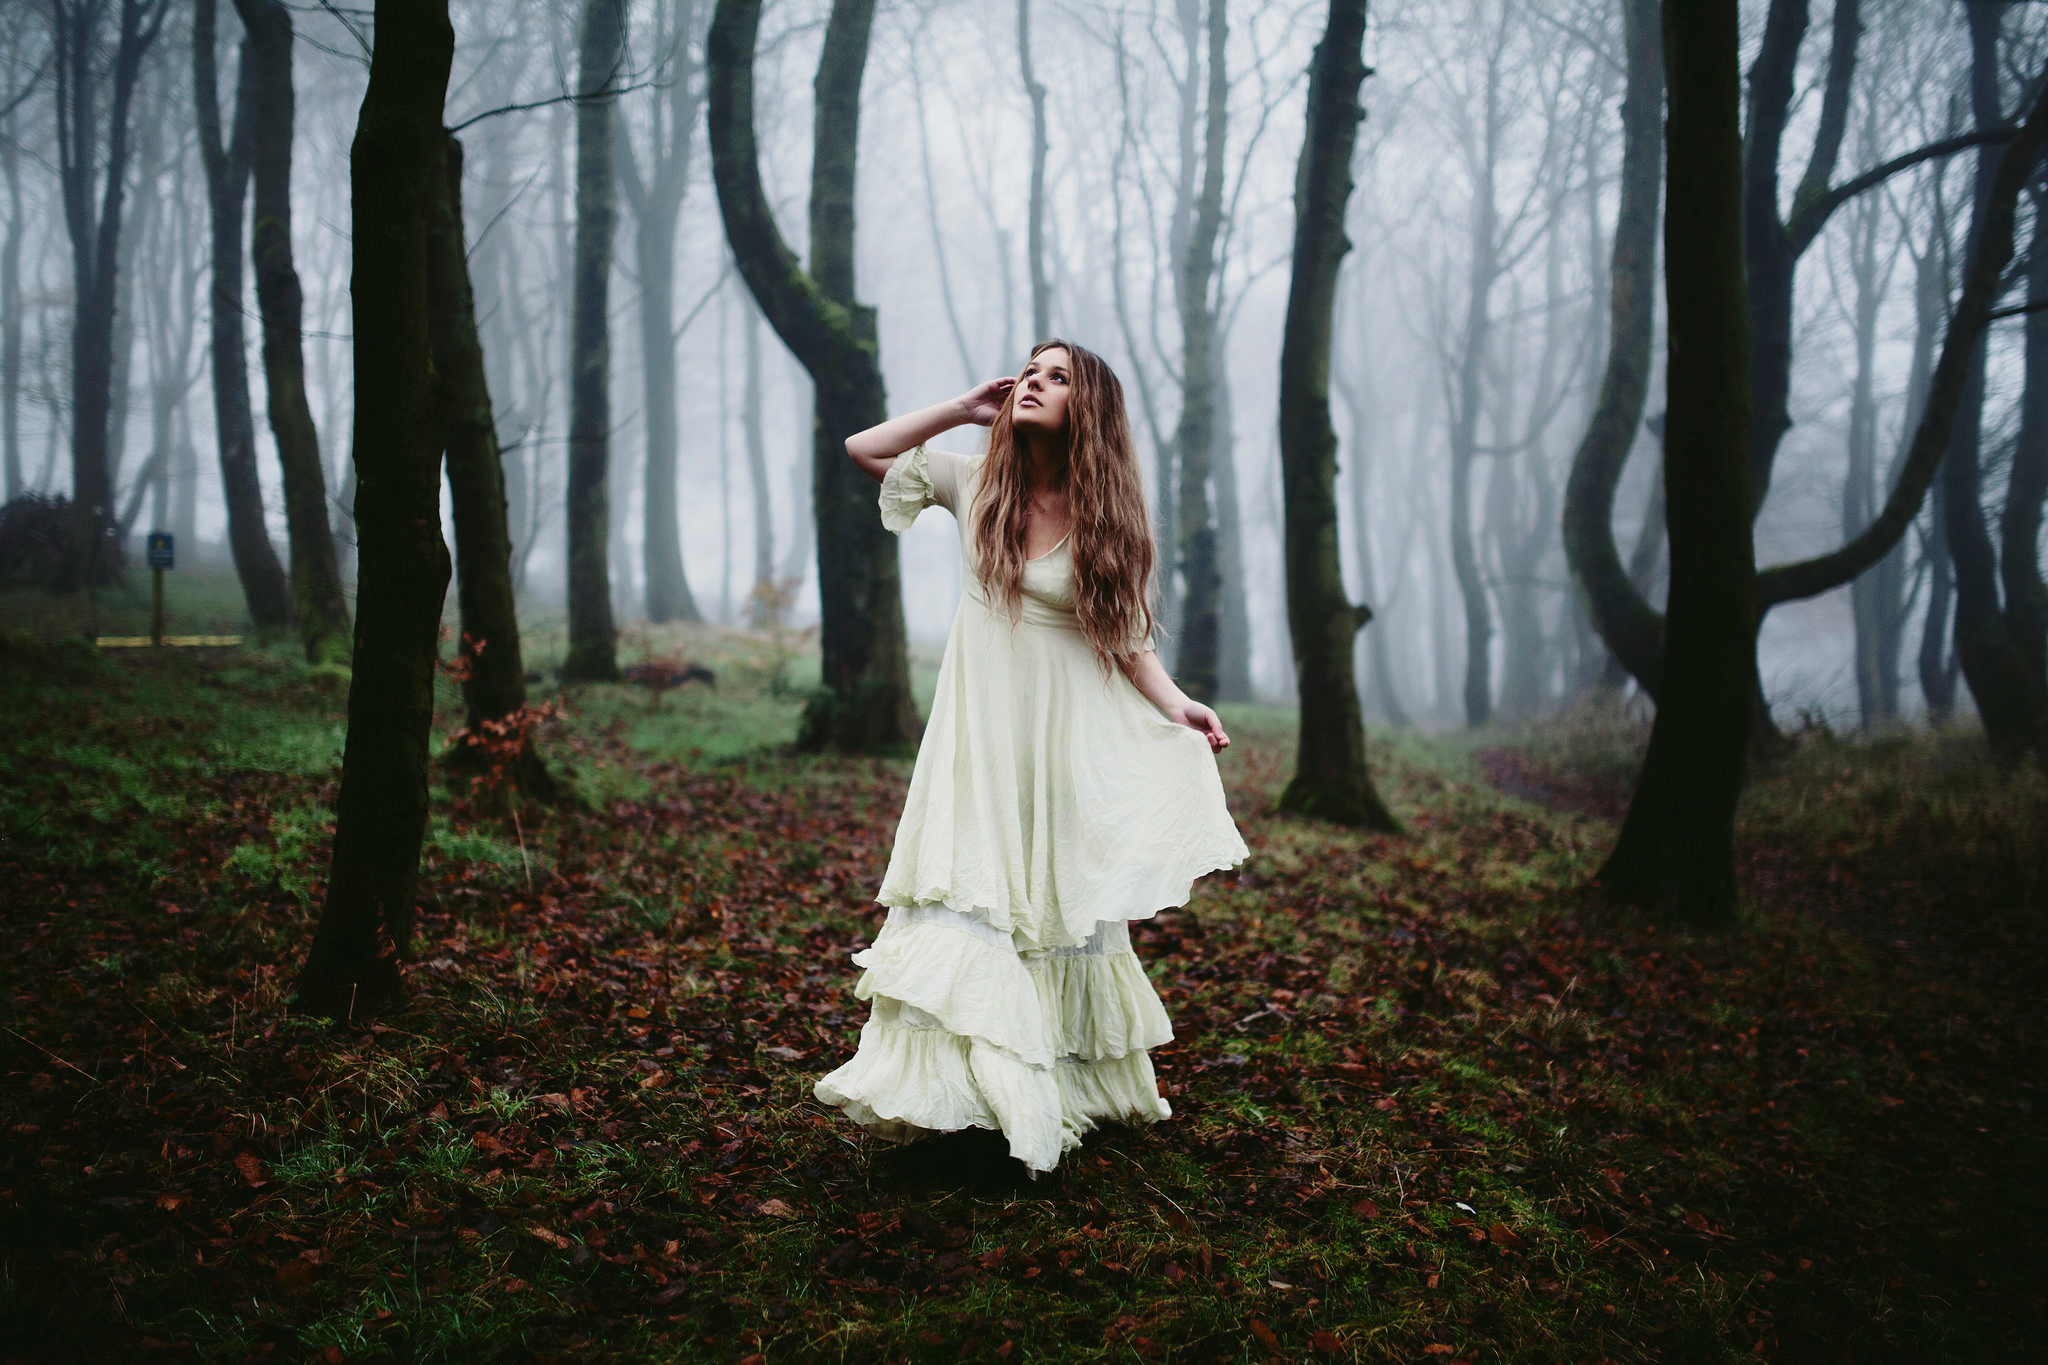 в лесу фото девушки